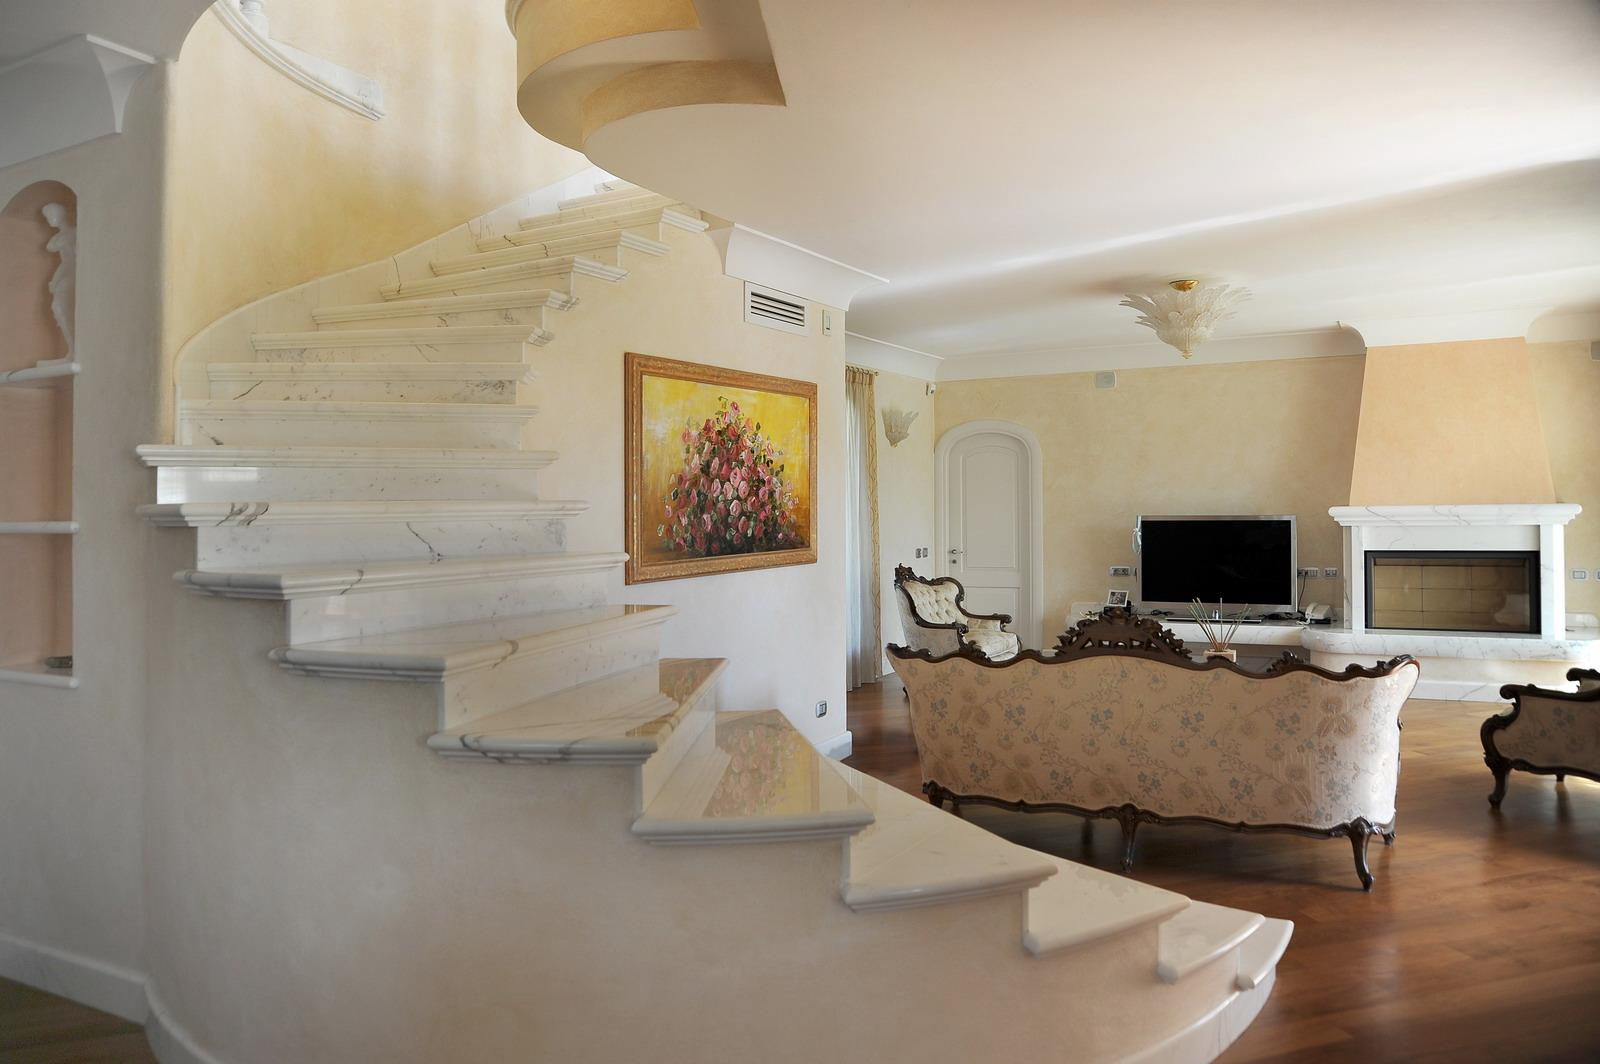 MEDONE MARMI Scala e Balaustra in Marmo Bianco Carrara - 5